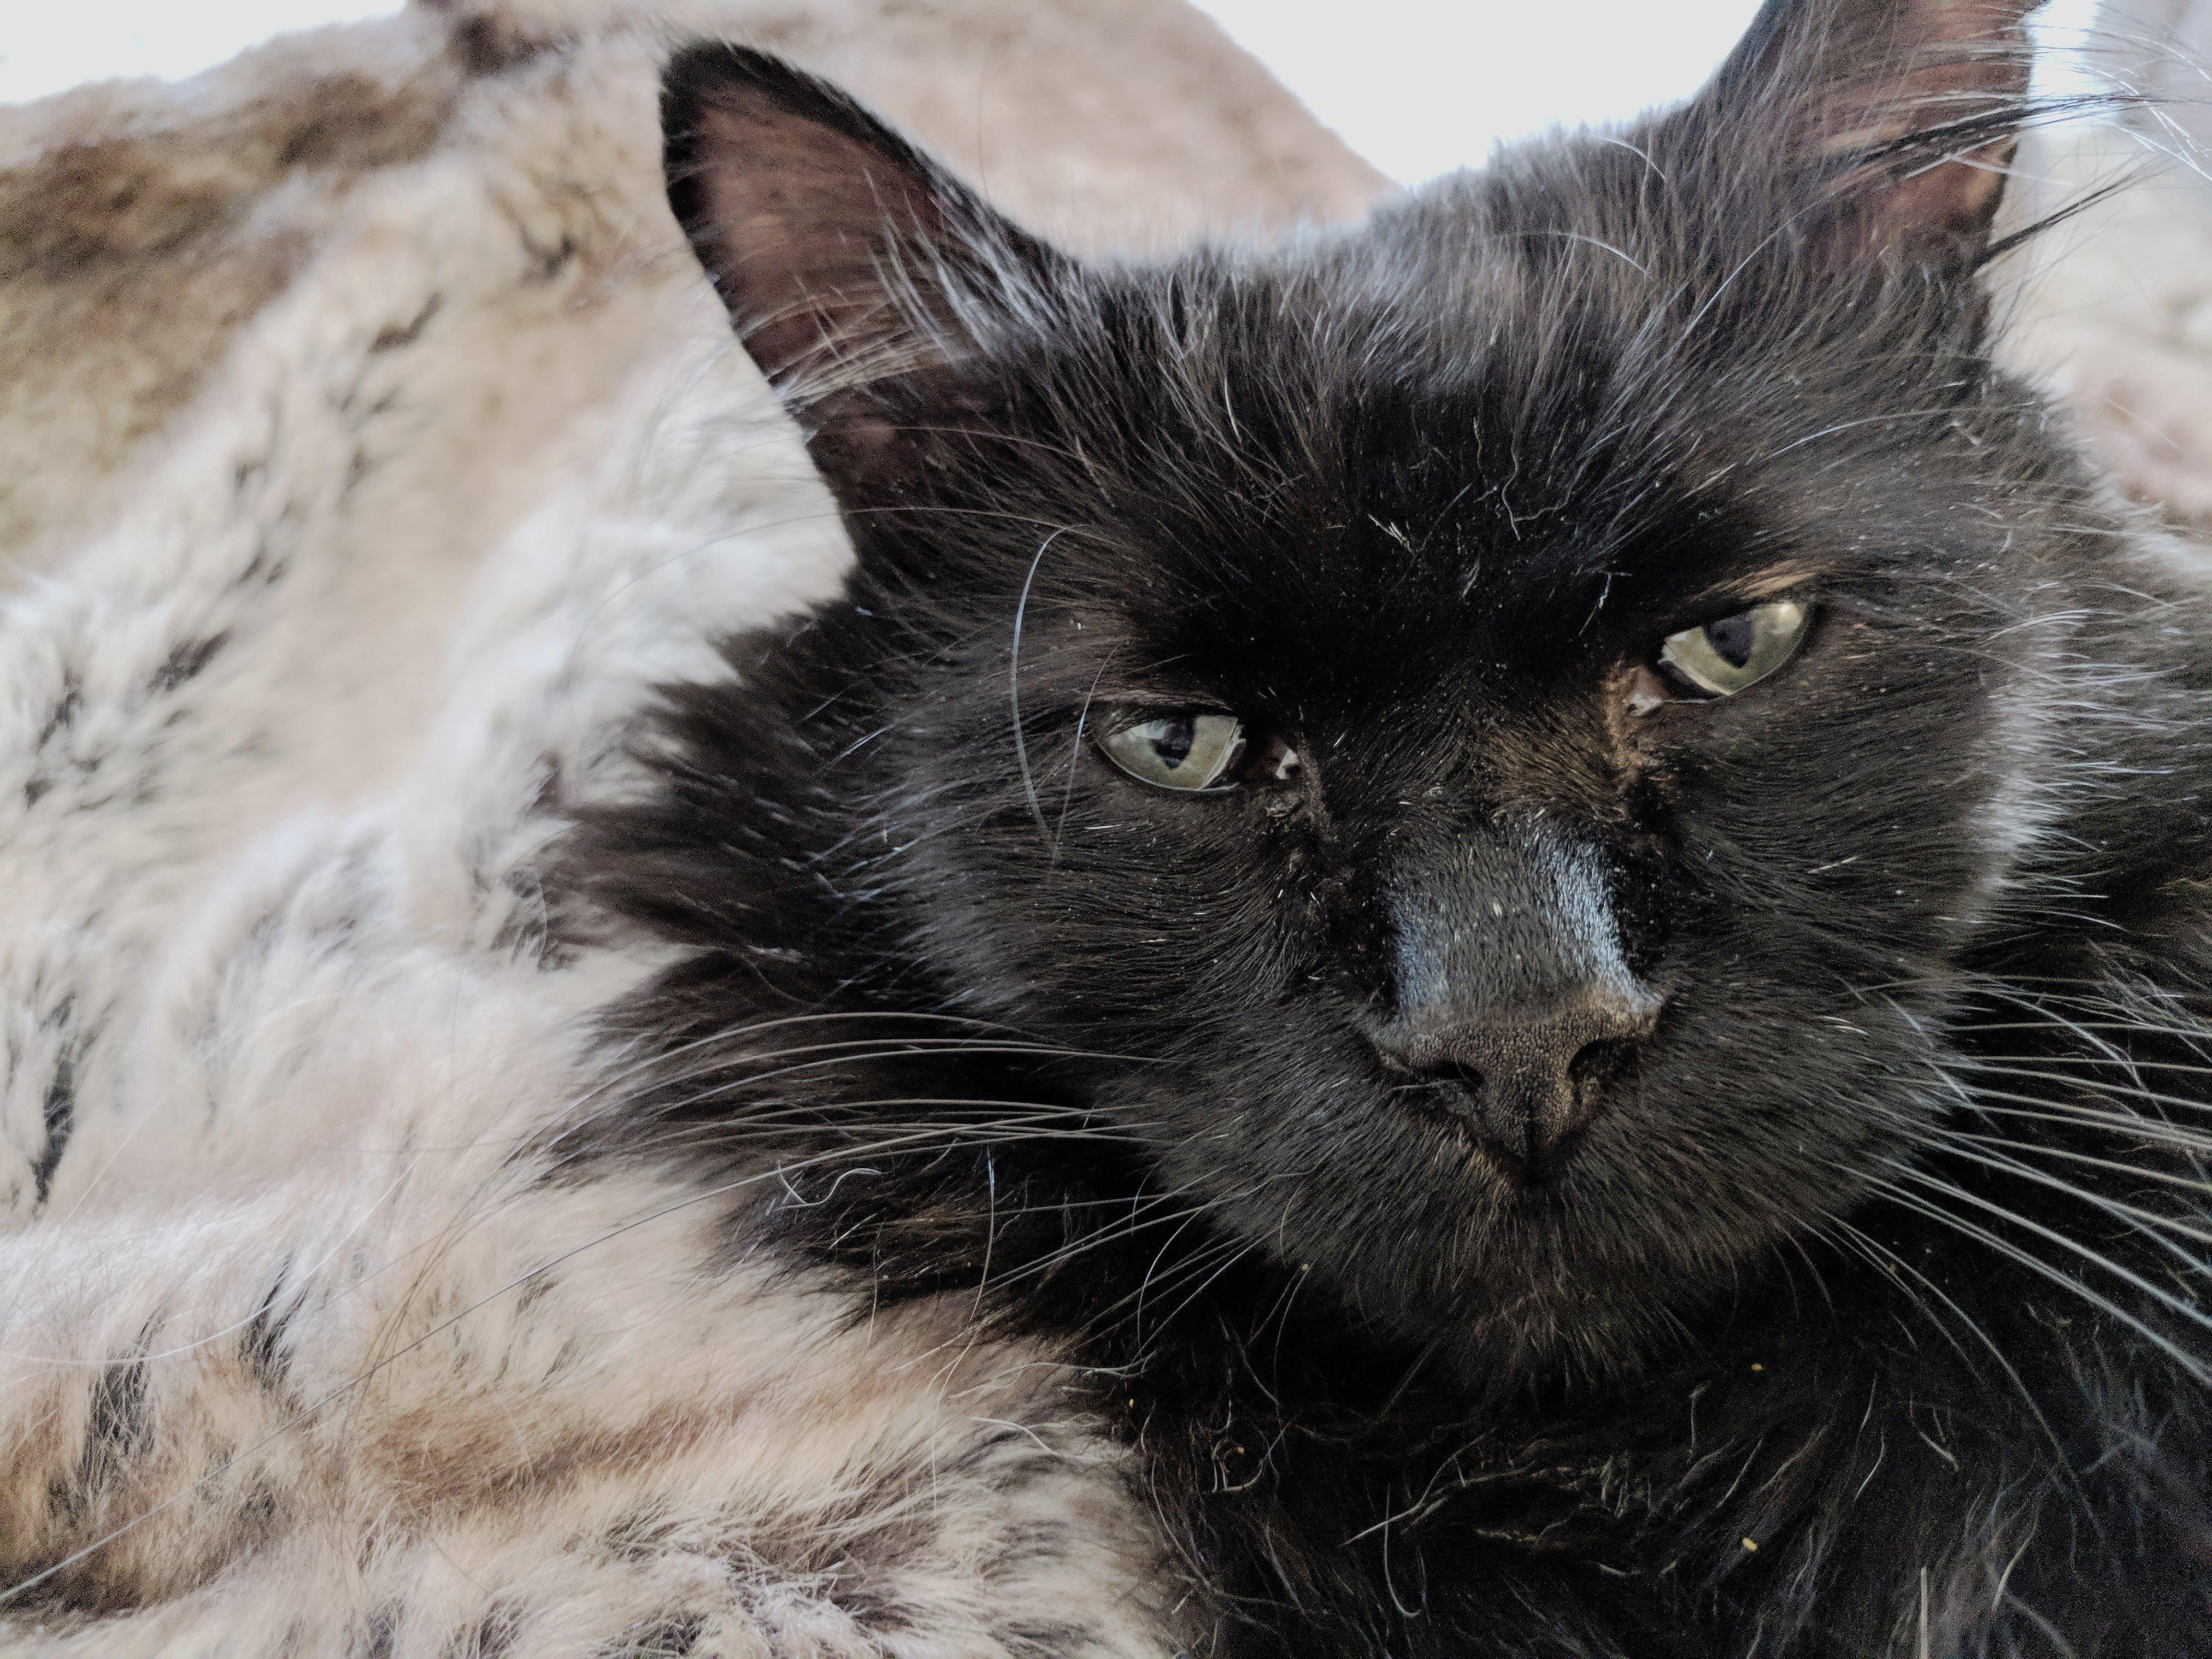 Free stock photo of animal, black cat, cat, cat face